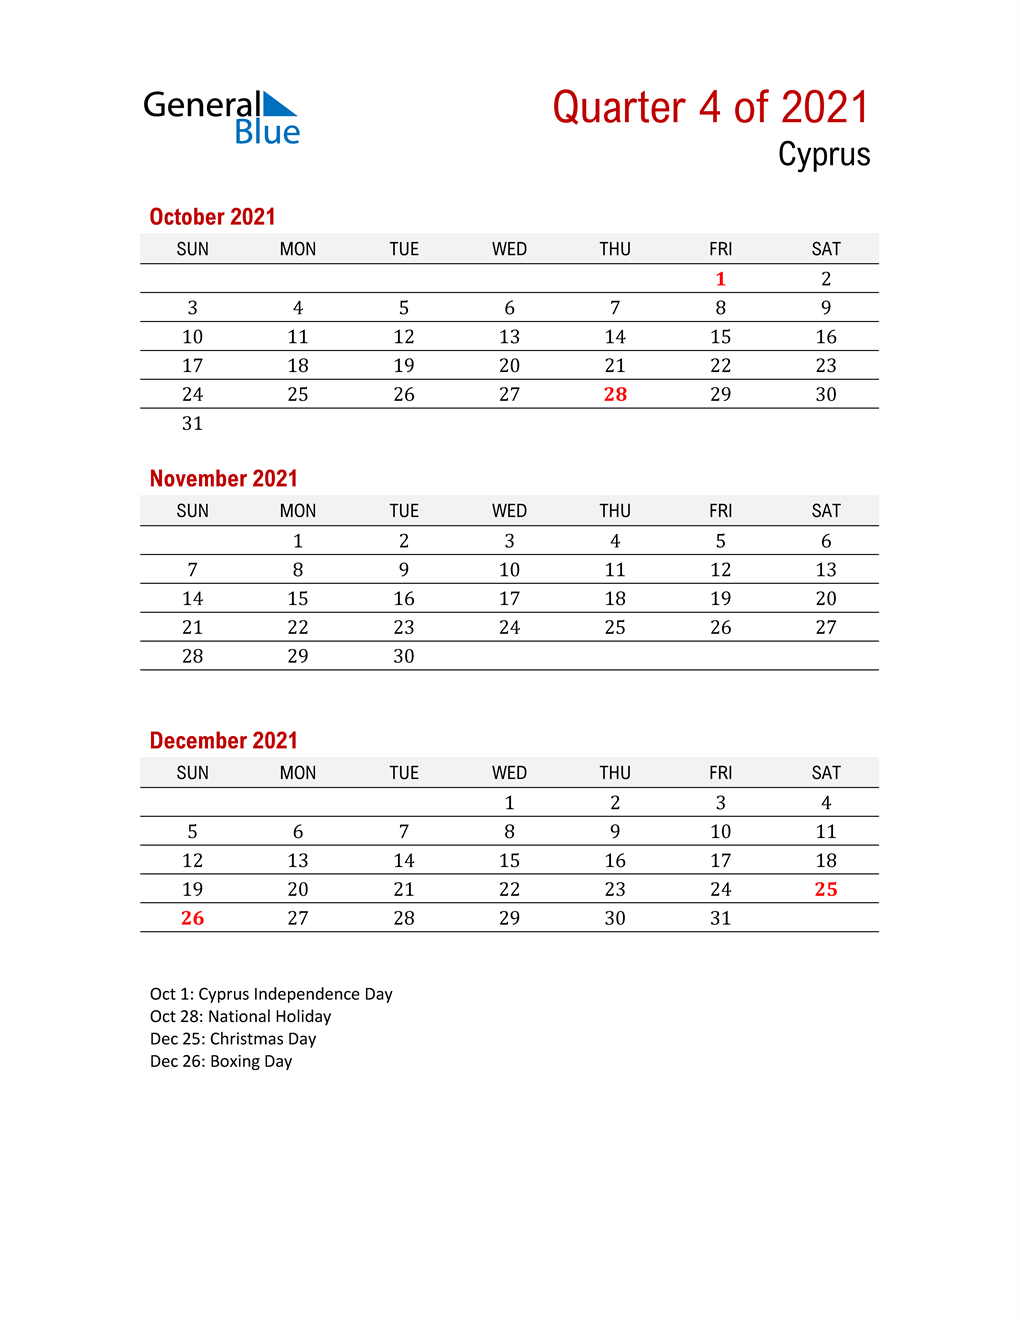 Printable Three Month Calendar for Cyprus